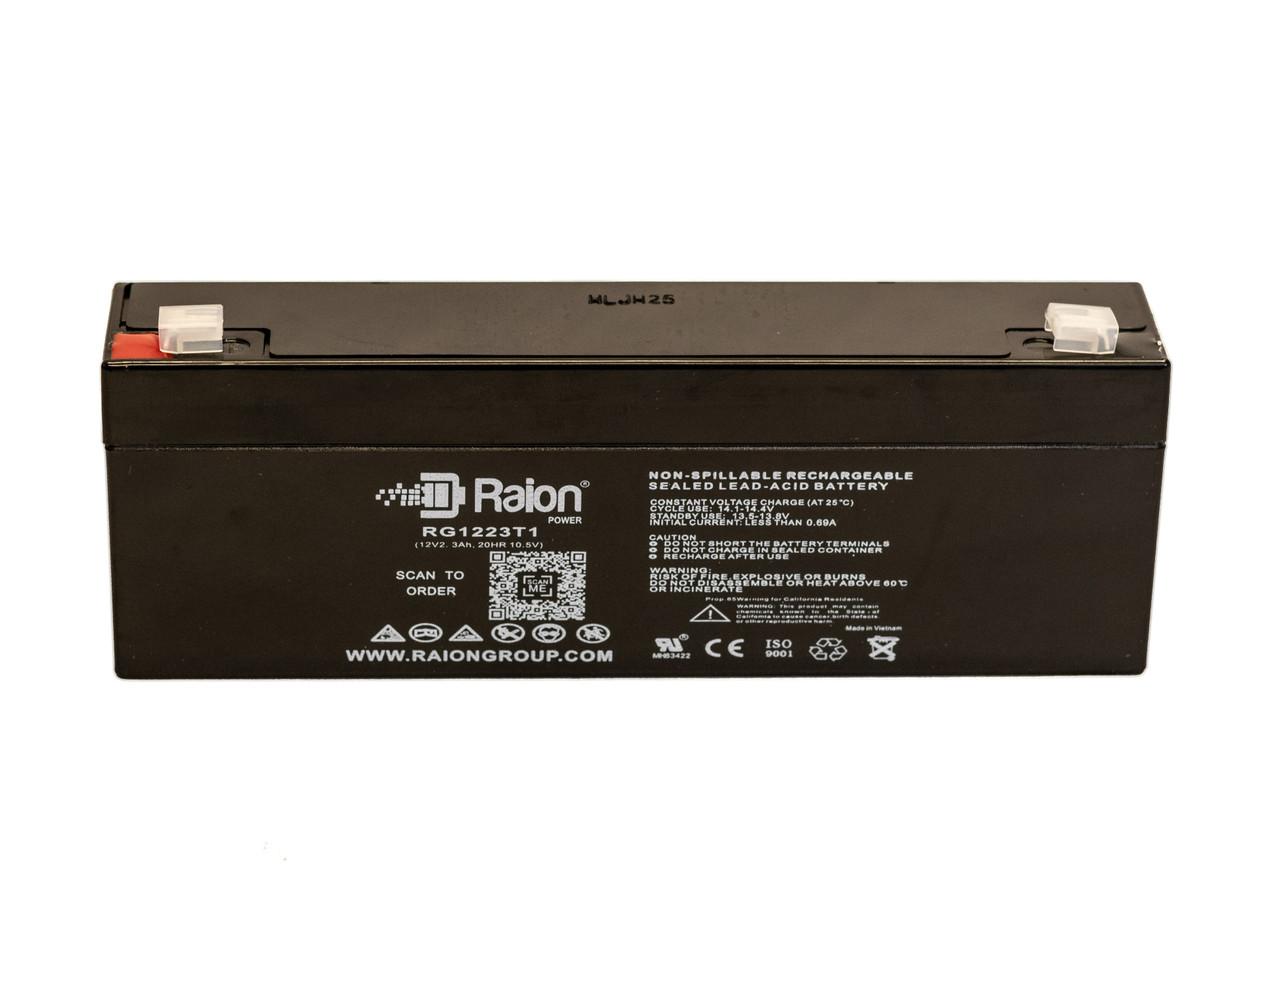 Raion Power 12 Volt 2.3Ah RG1223T1 Replacement SLA Battery With T1 Terminals